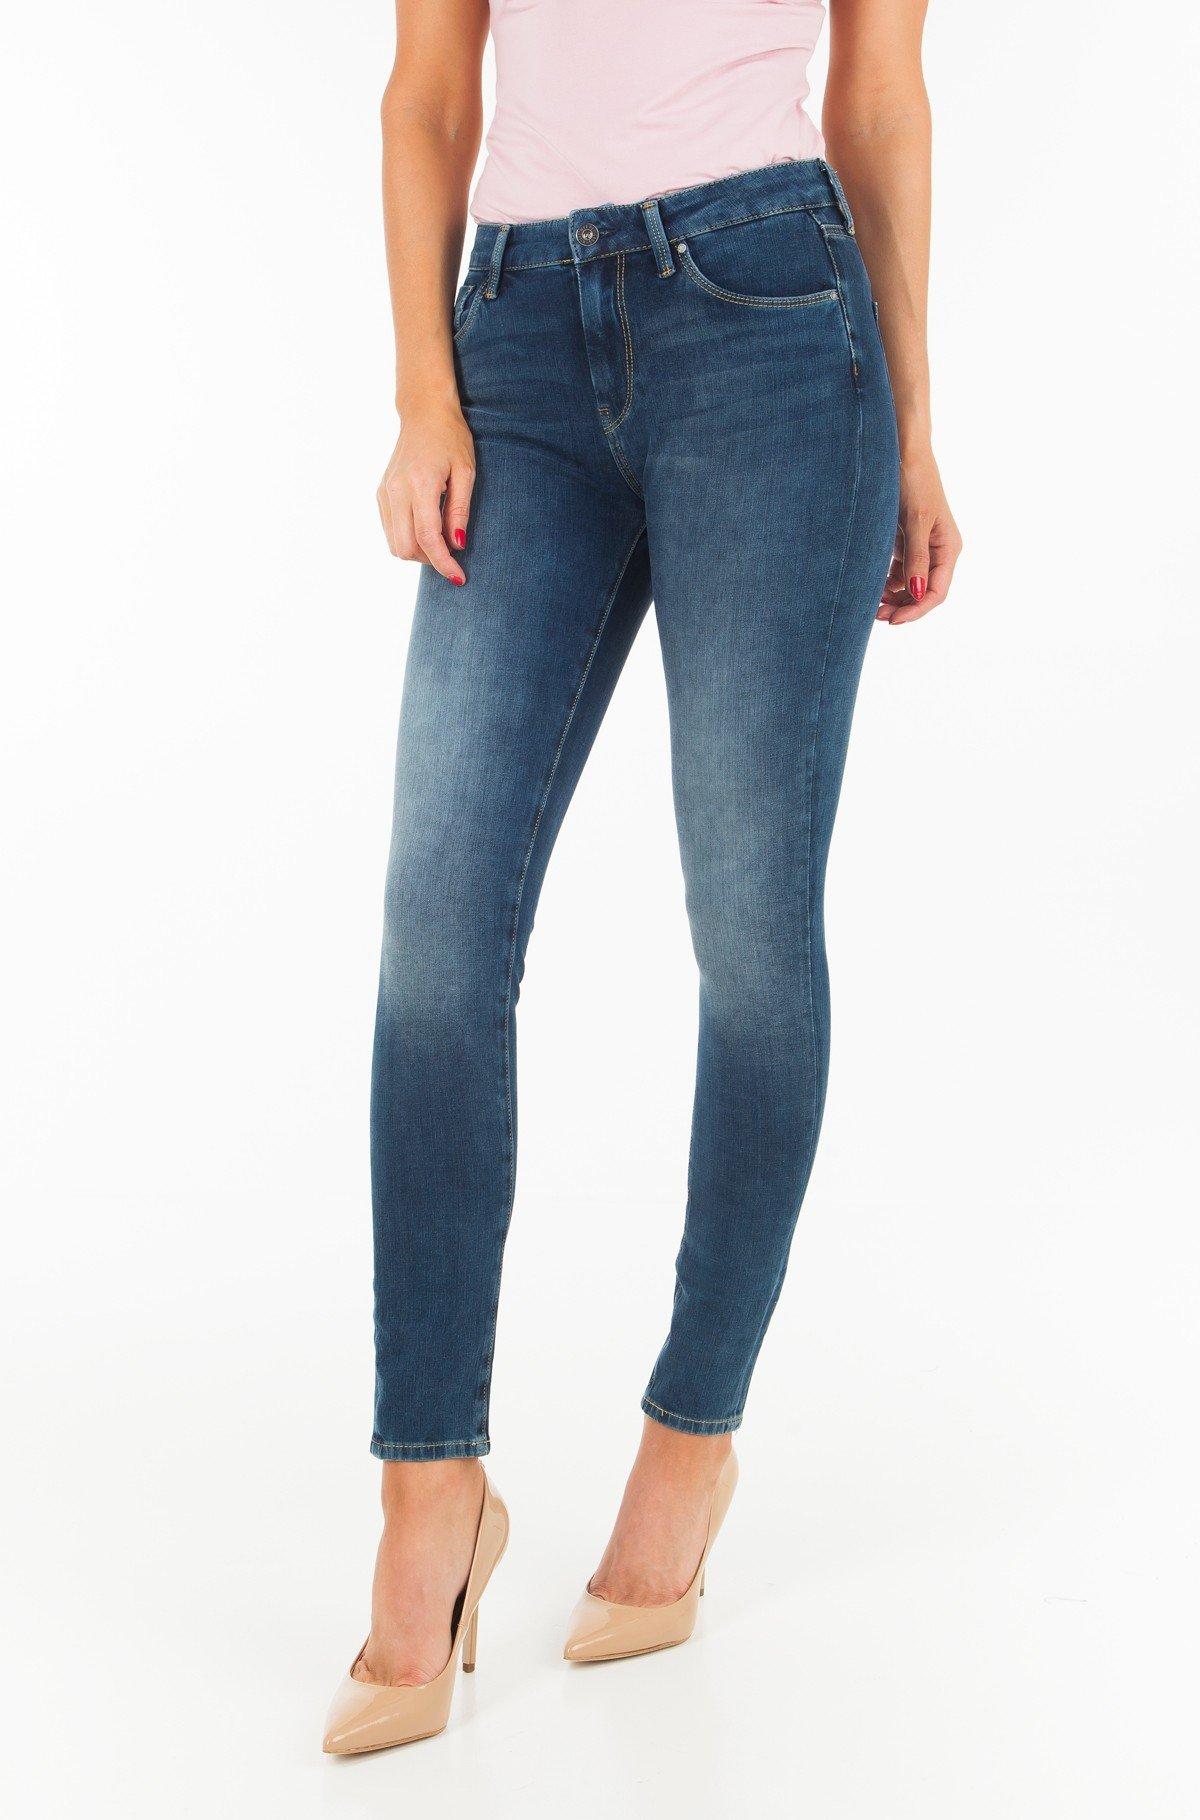 Jeans REGENT/PL200398CG8-full-1